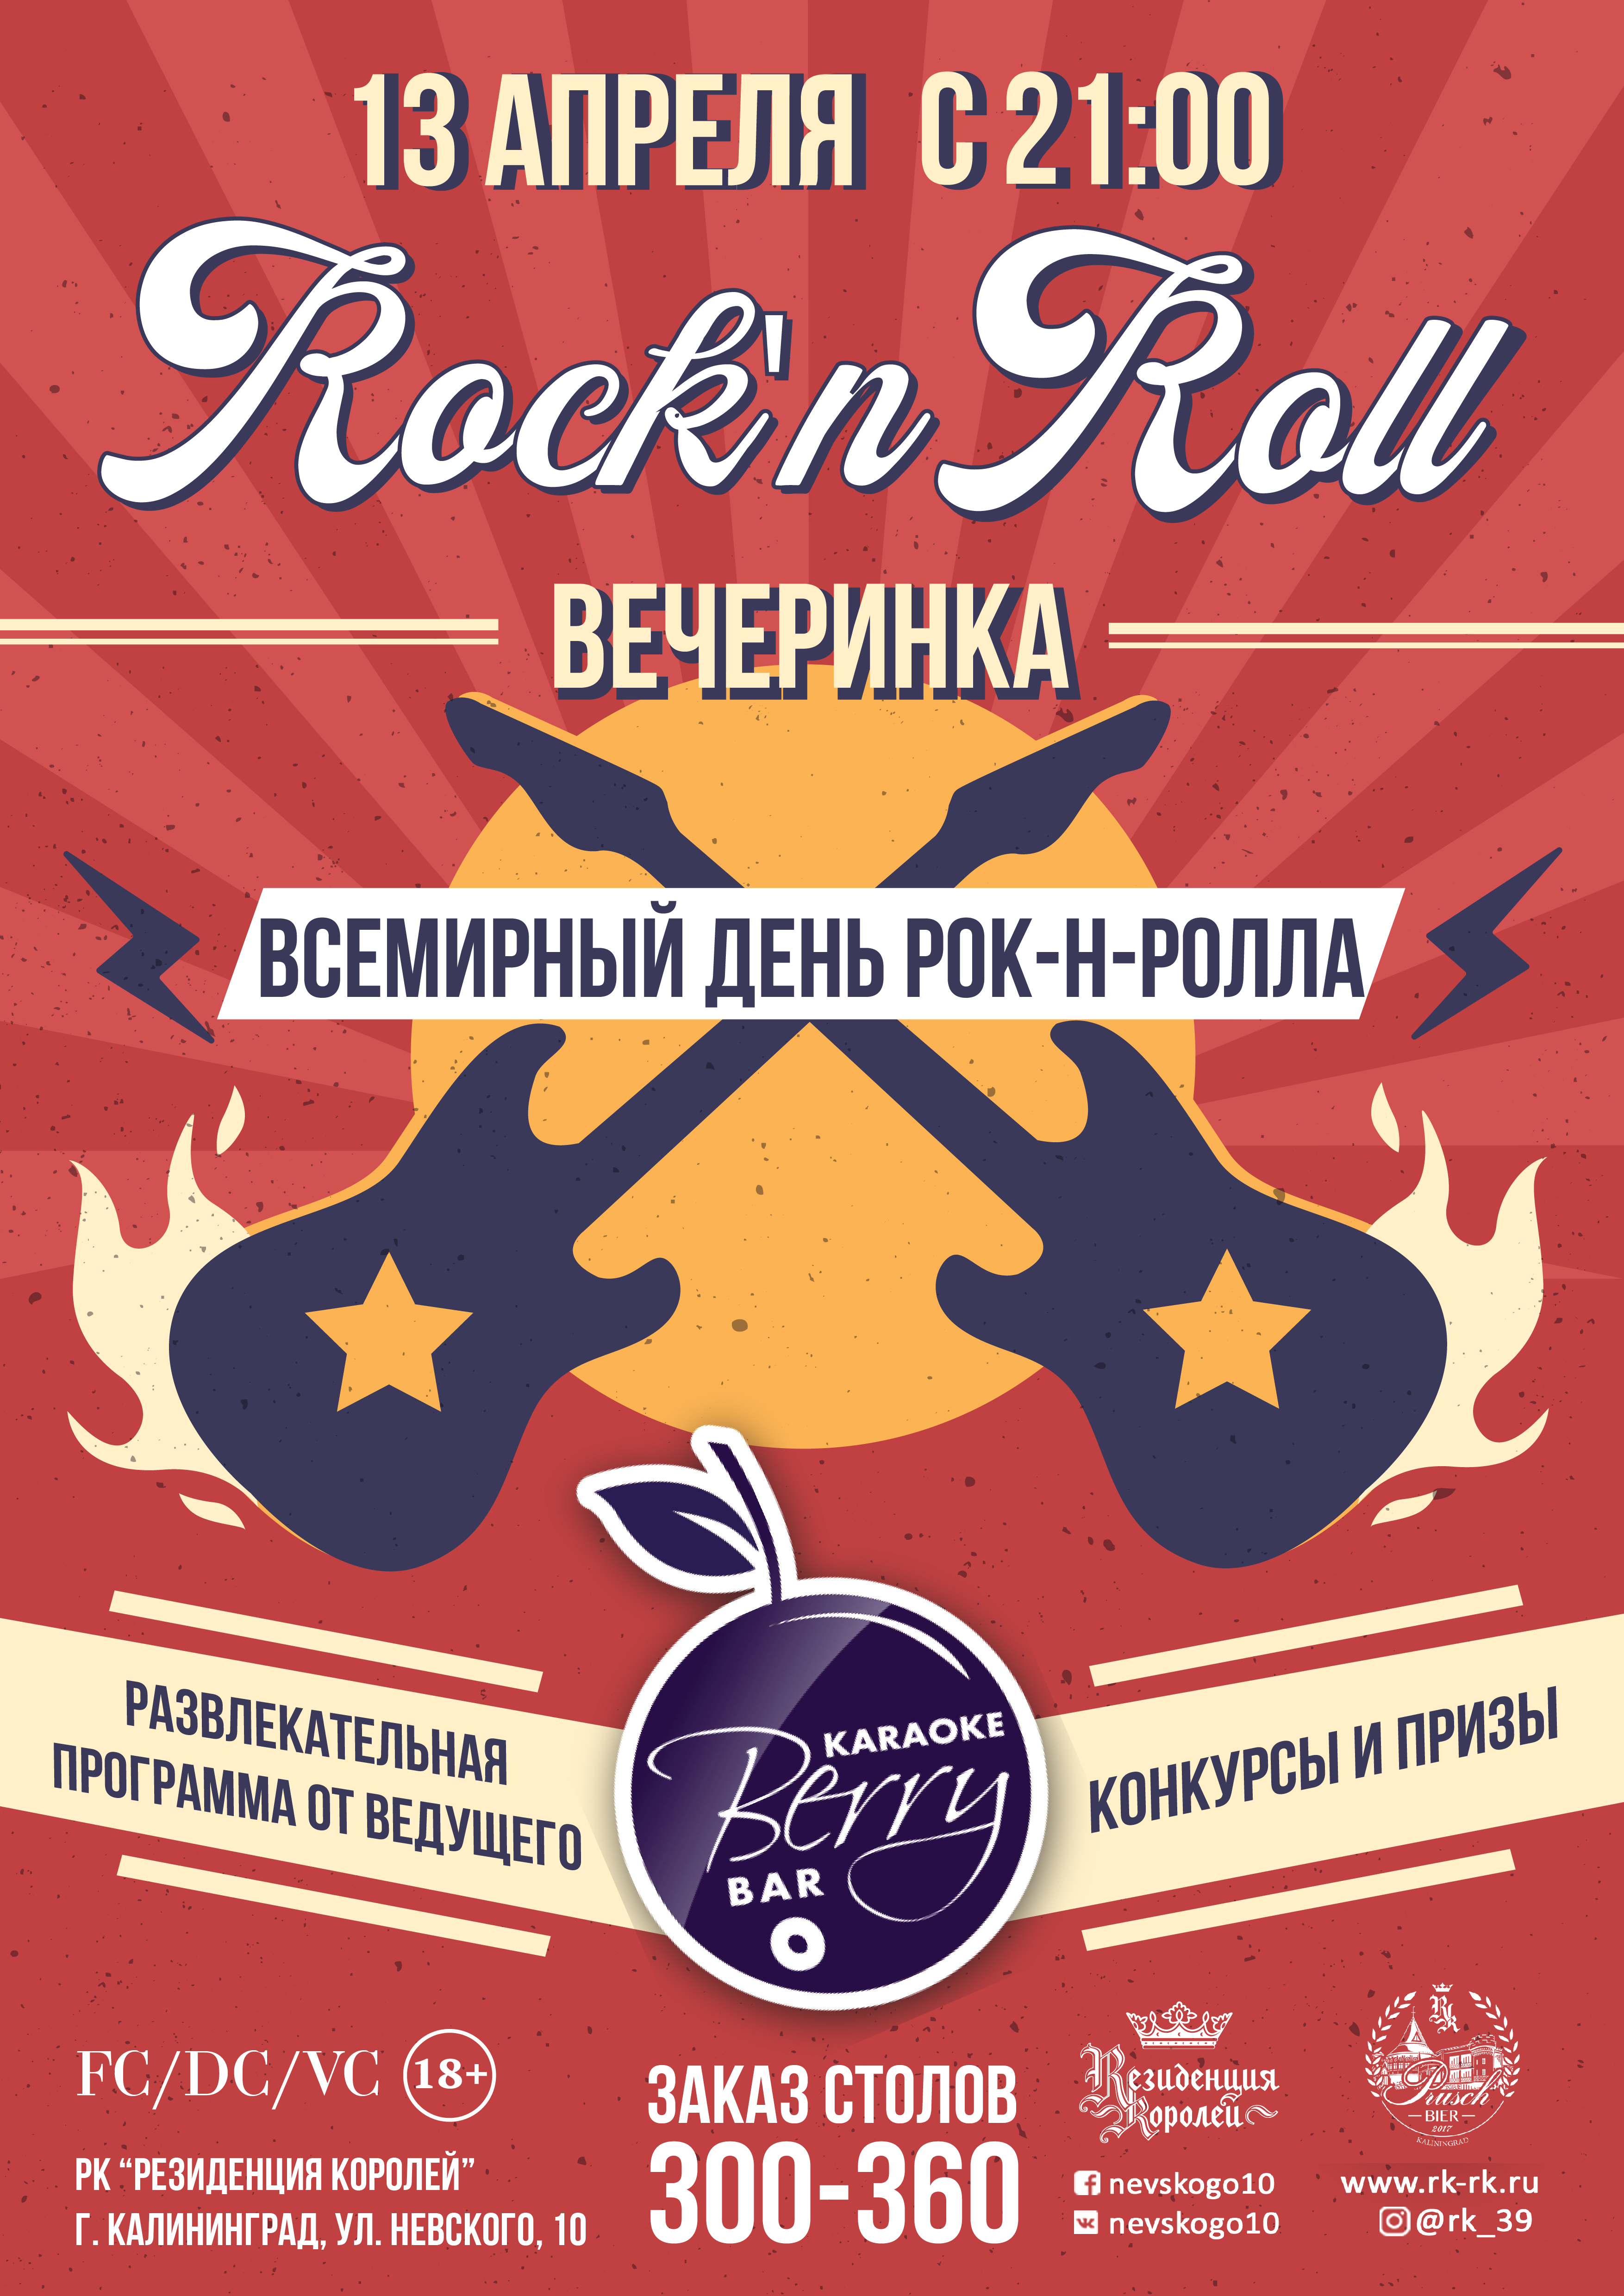 13 апреля День Рок-н-ролла А1